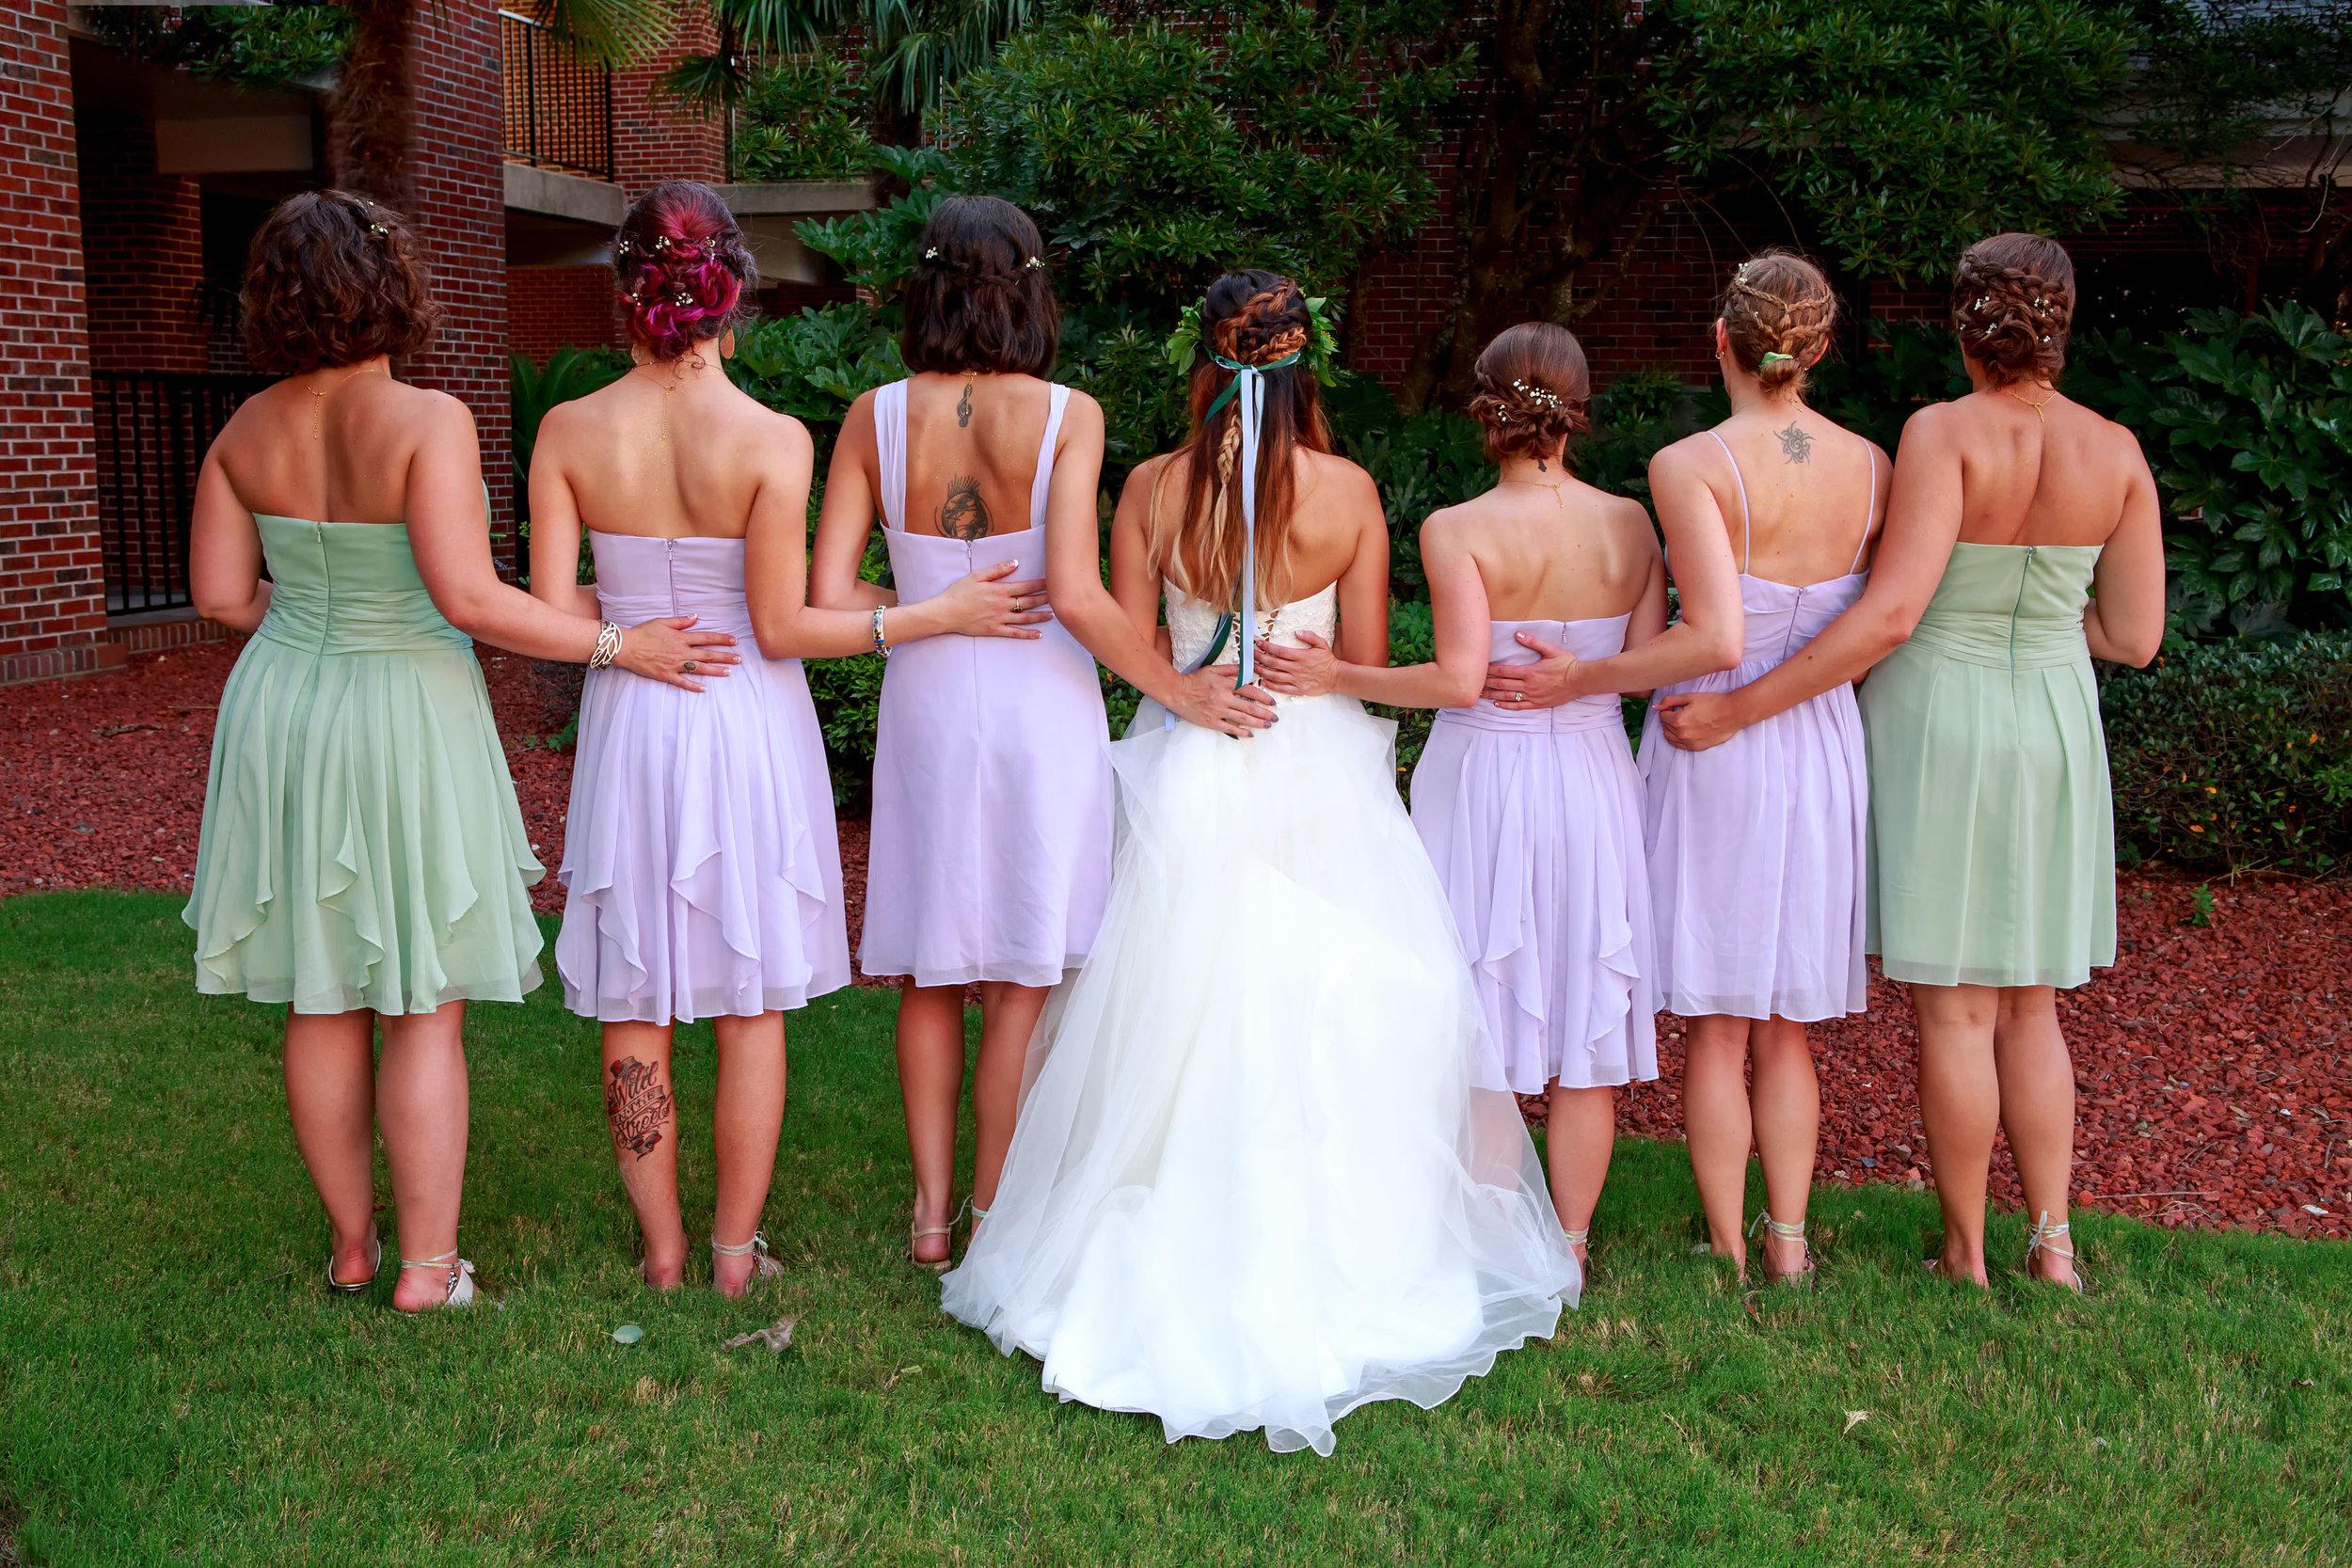 North_Carolina_Wedding_Photographer_Tiffany_Abruzzo_Group_4.jpg